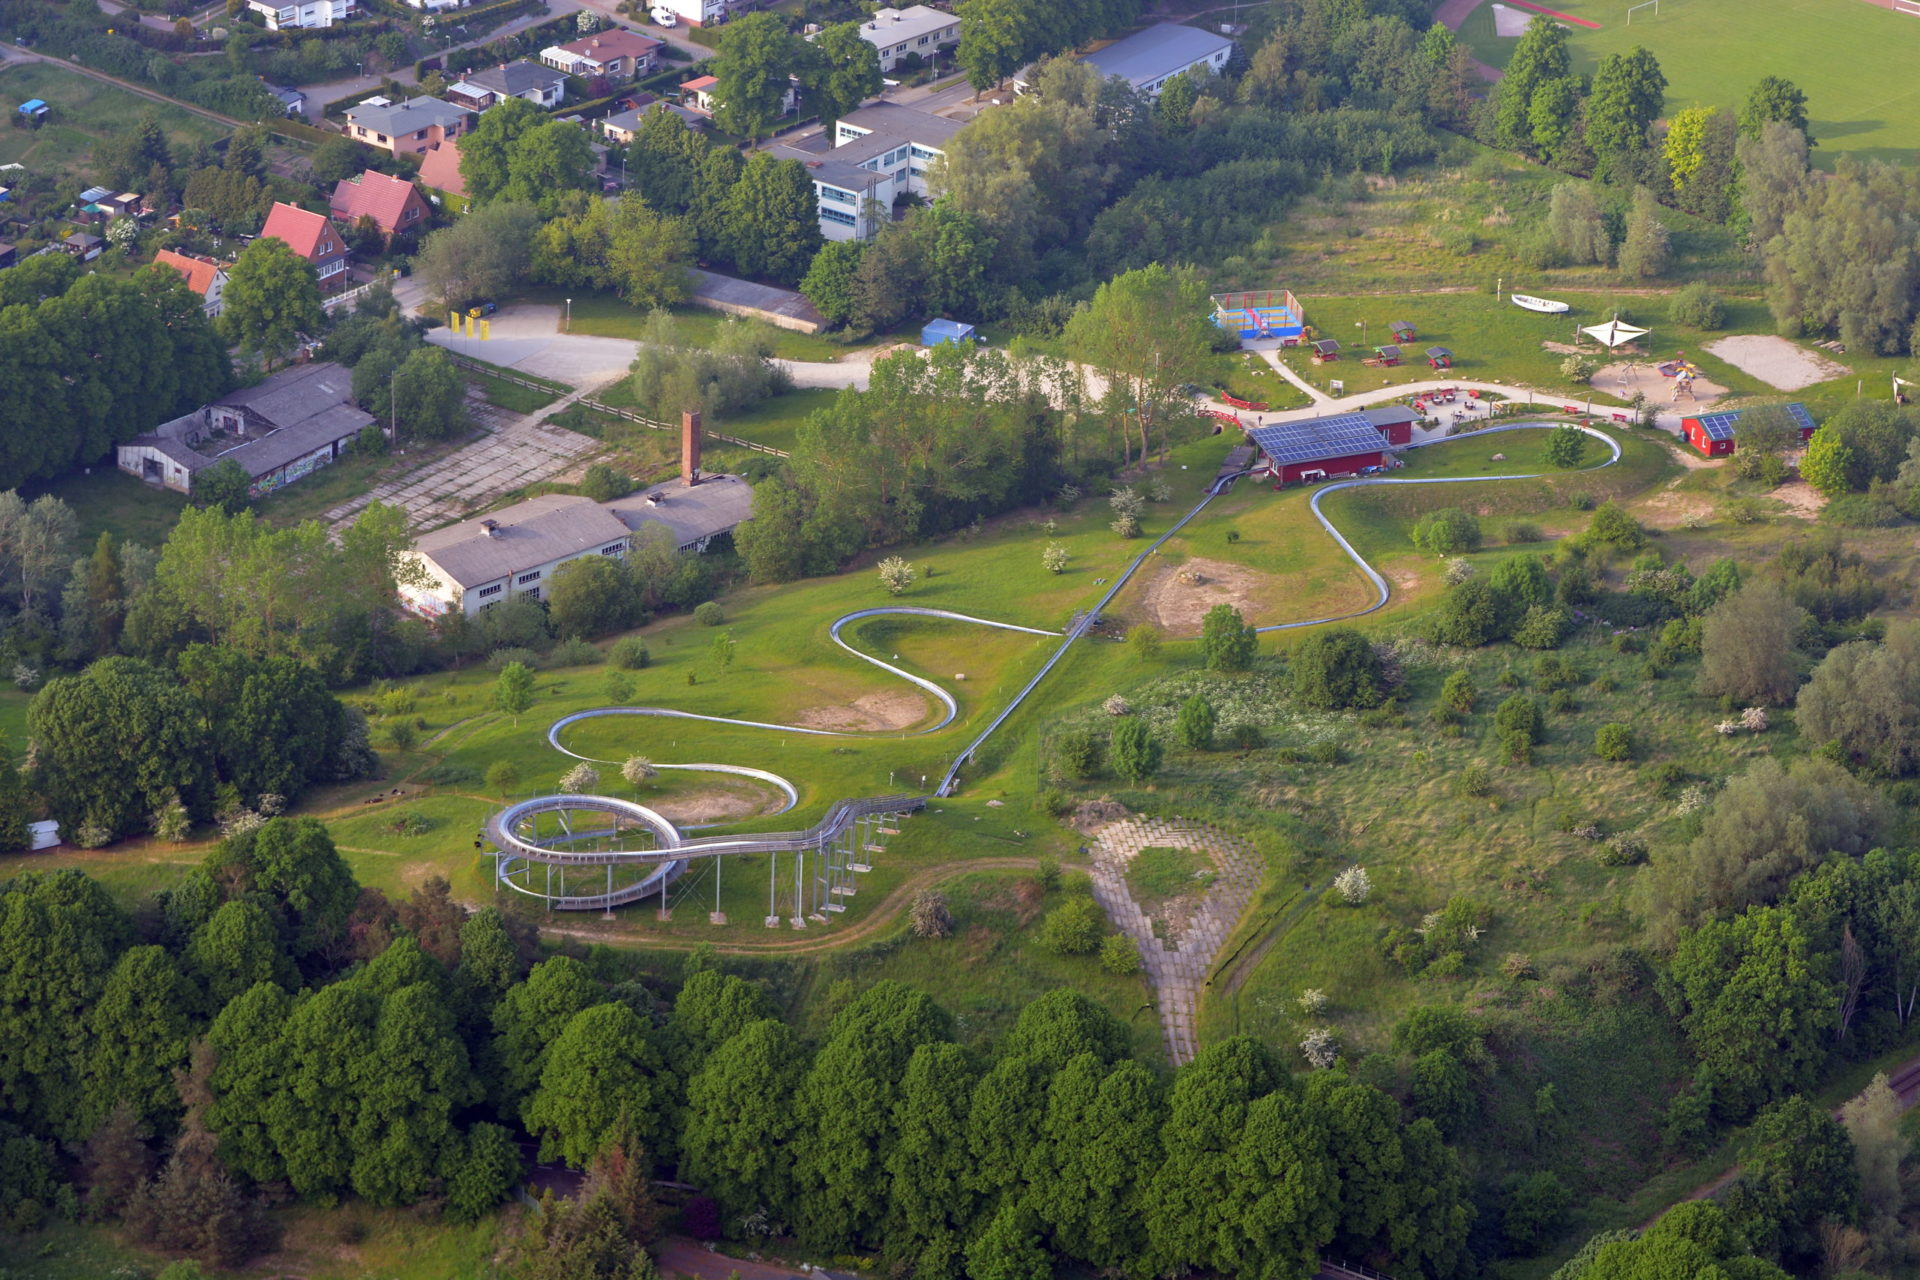 Luftbild Sommerrodelbahn Bad Doberan